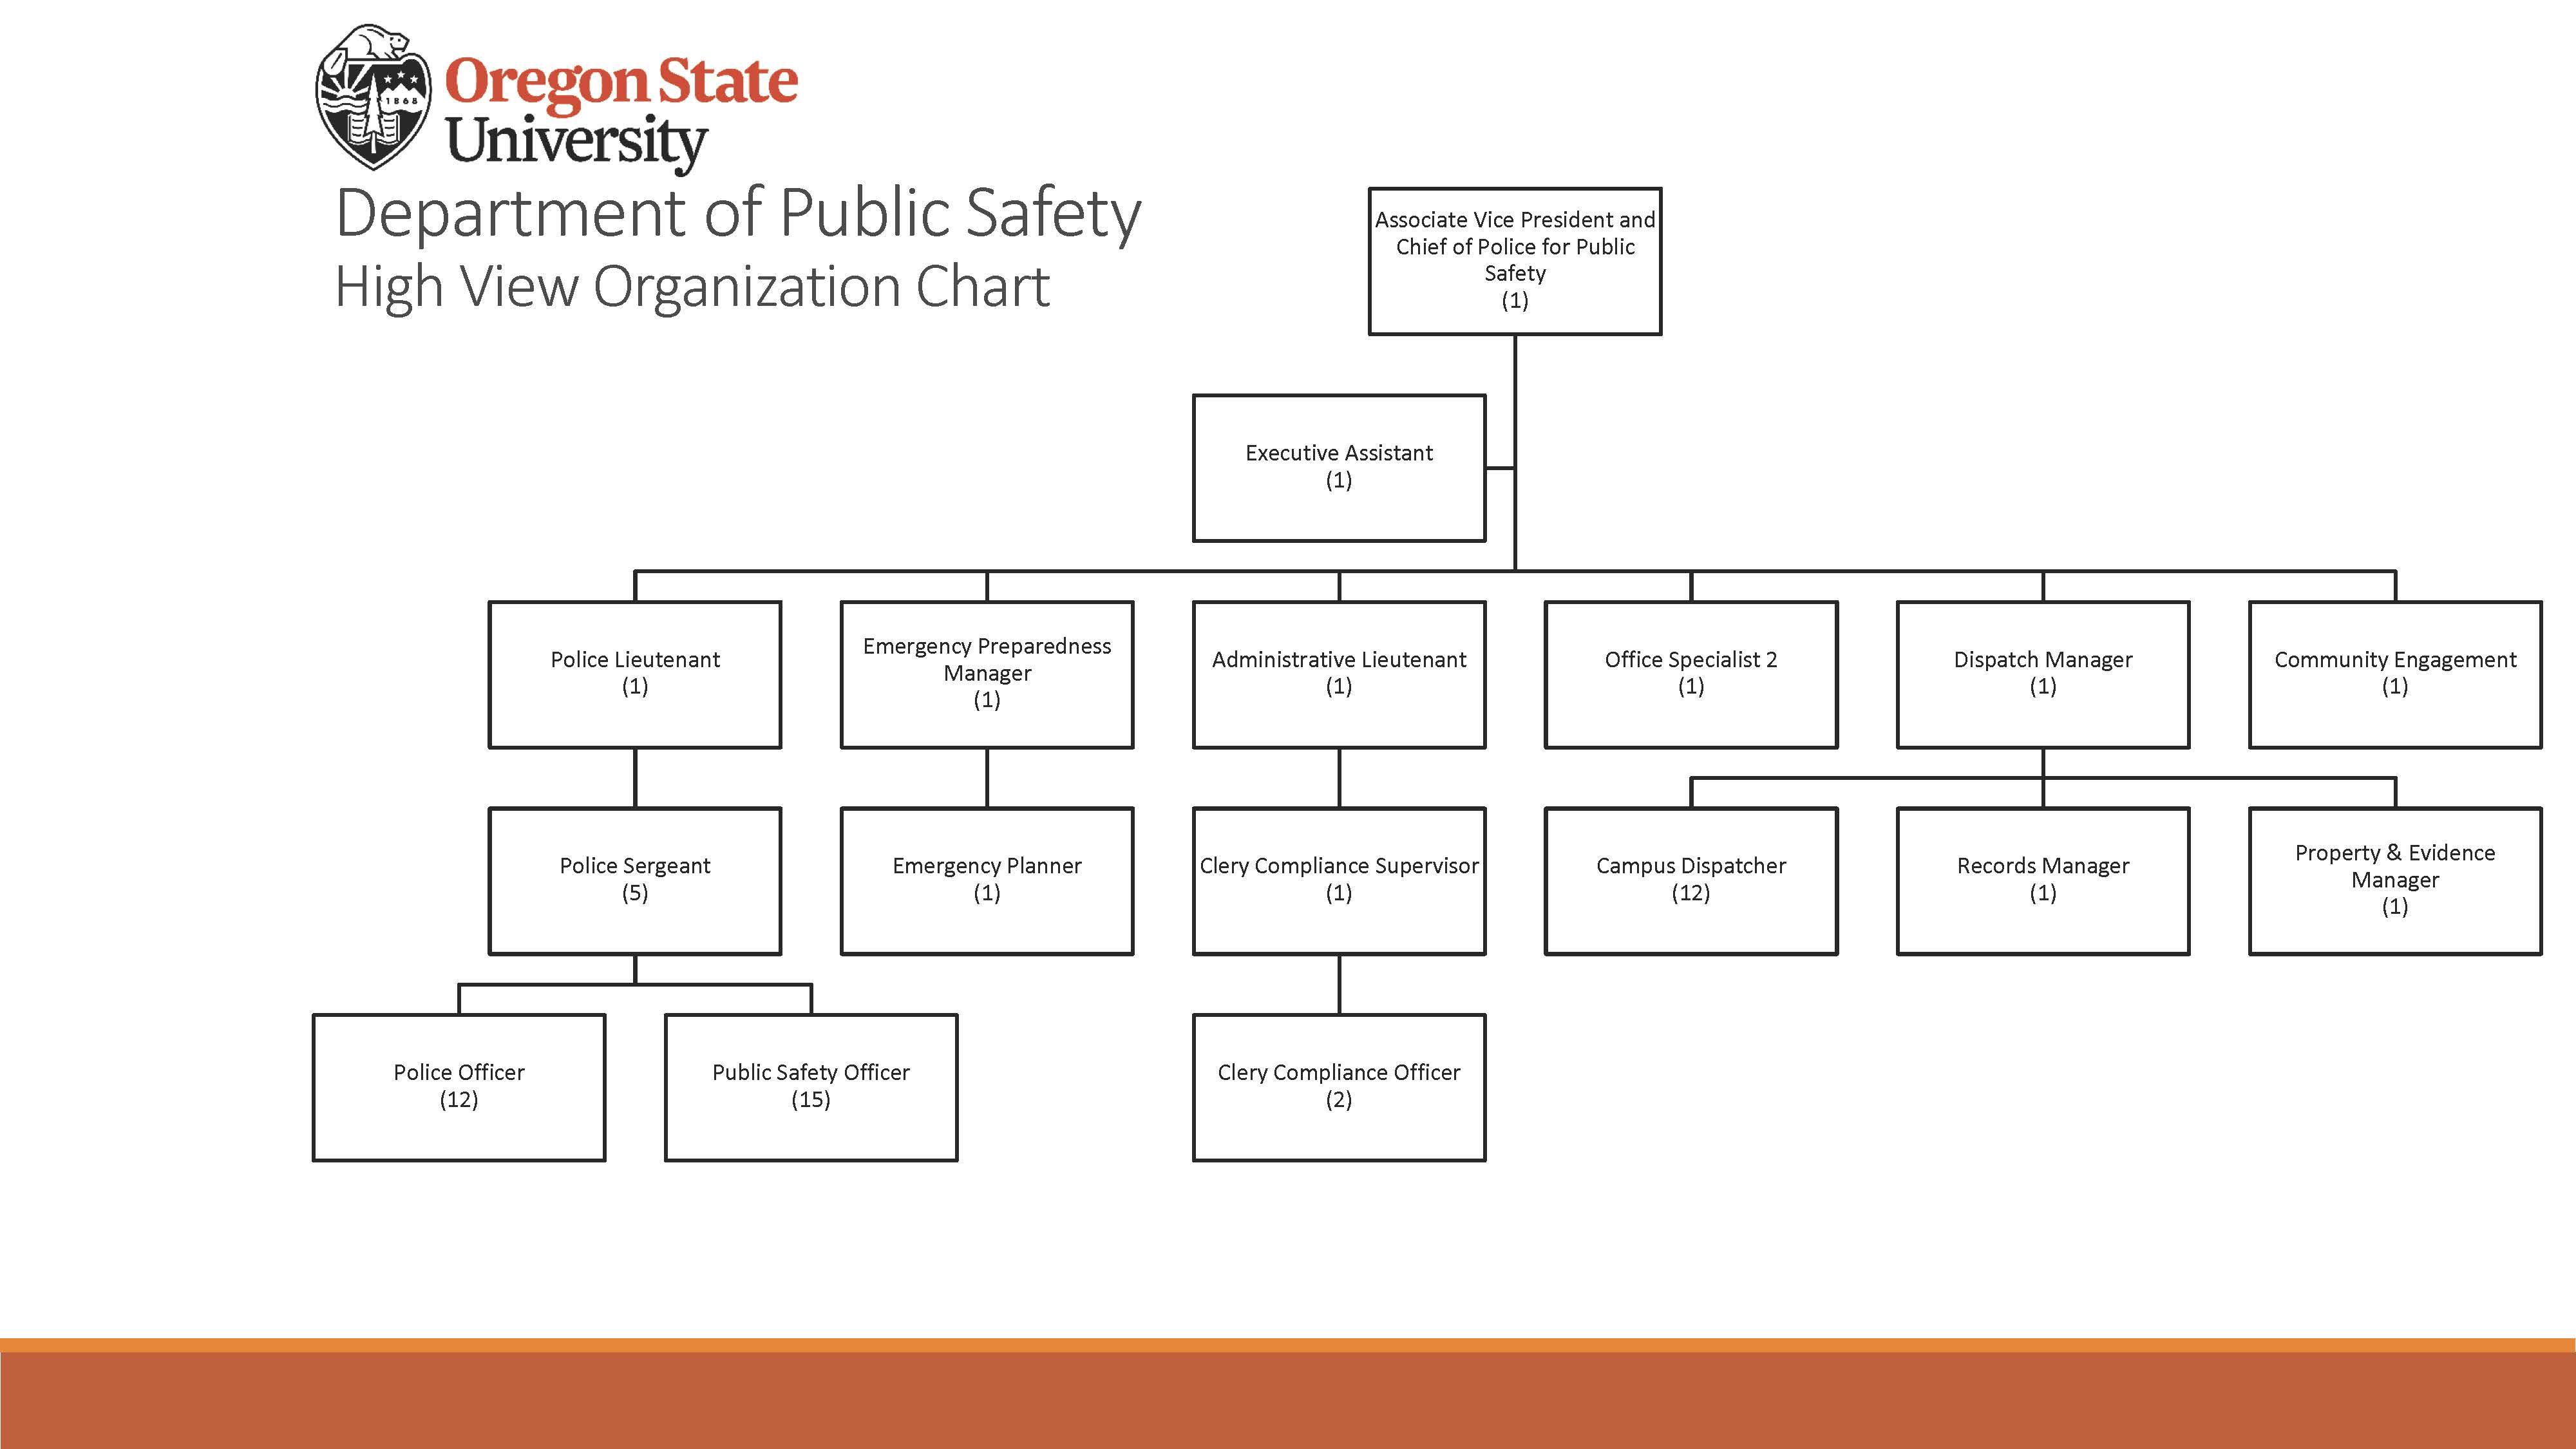 DPS Organizational Chart